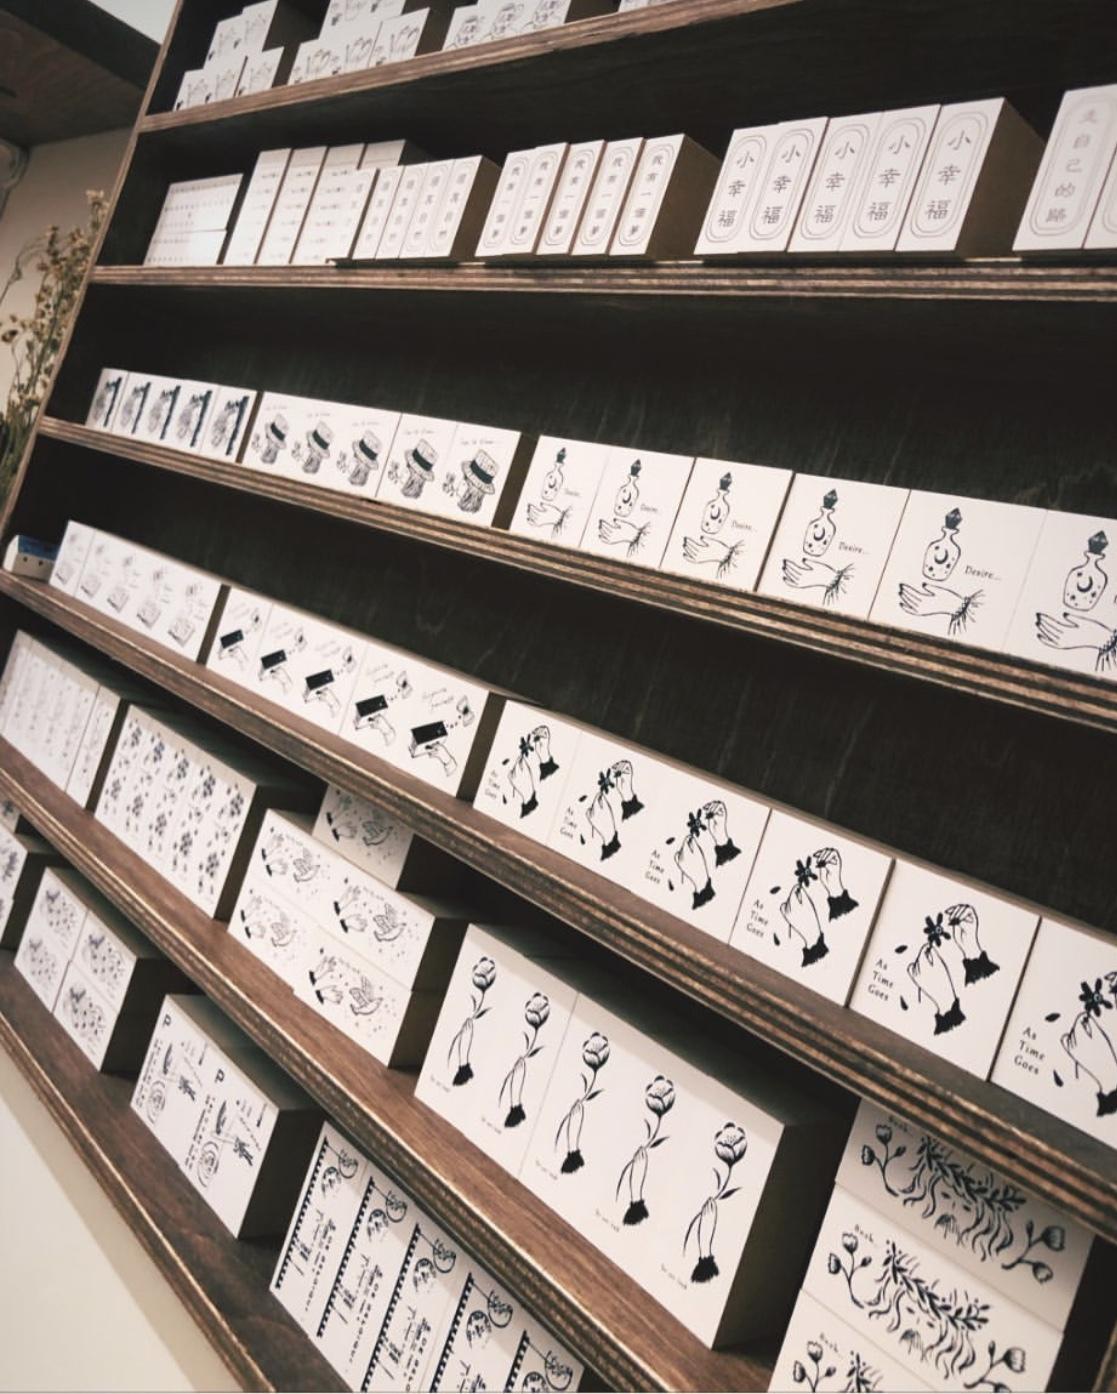 NYイーストビレッジのniconeco zakkaya さんに納品しています_a0137727_22040292.jpeg